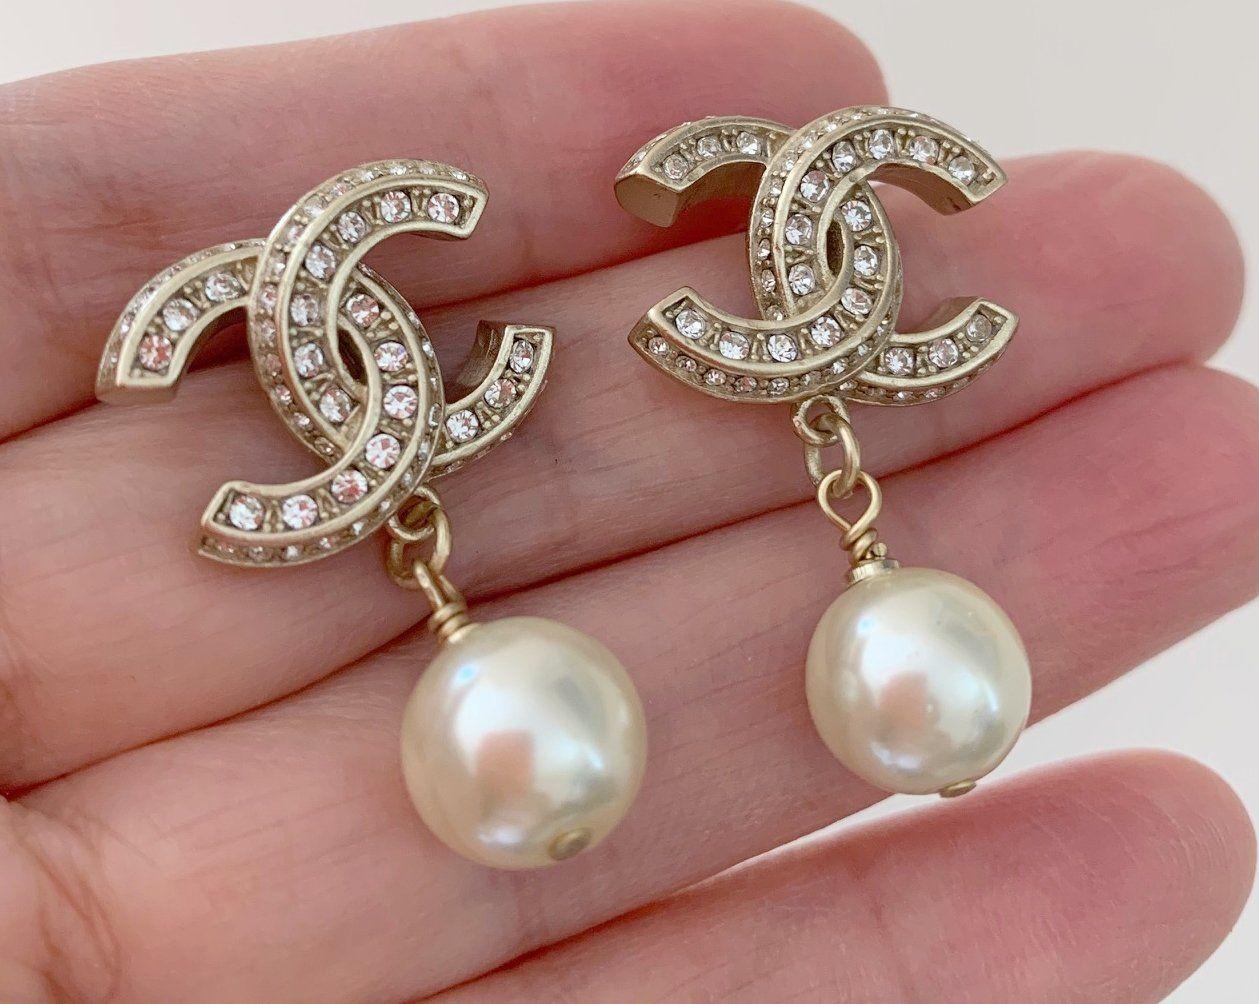 dfb9a7864 CHANEL+Classic+Crystal+Pearl+Dangle+Earrings+GOLD+CC+Stud+NIB ...